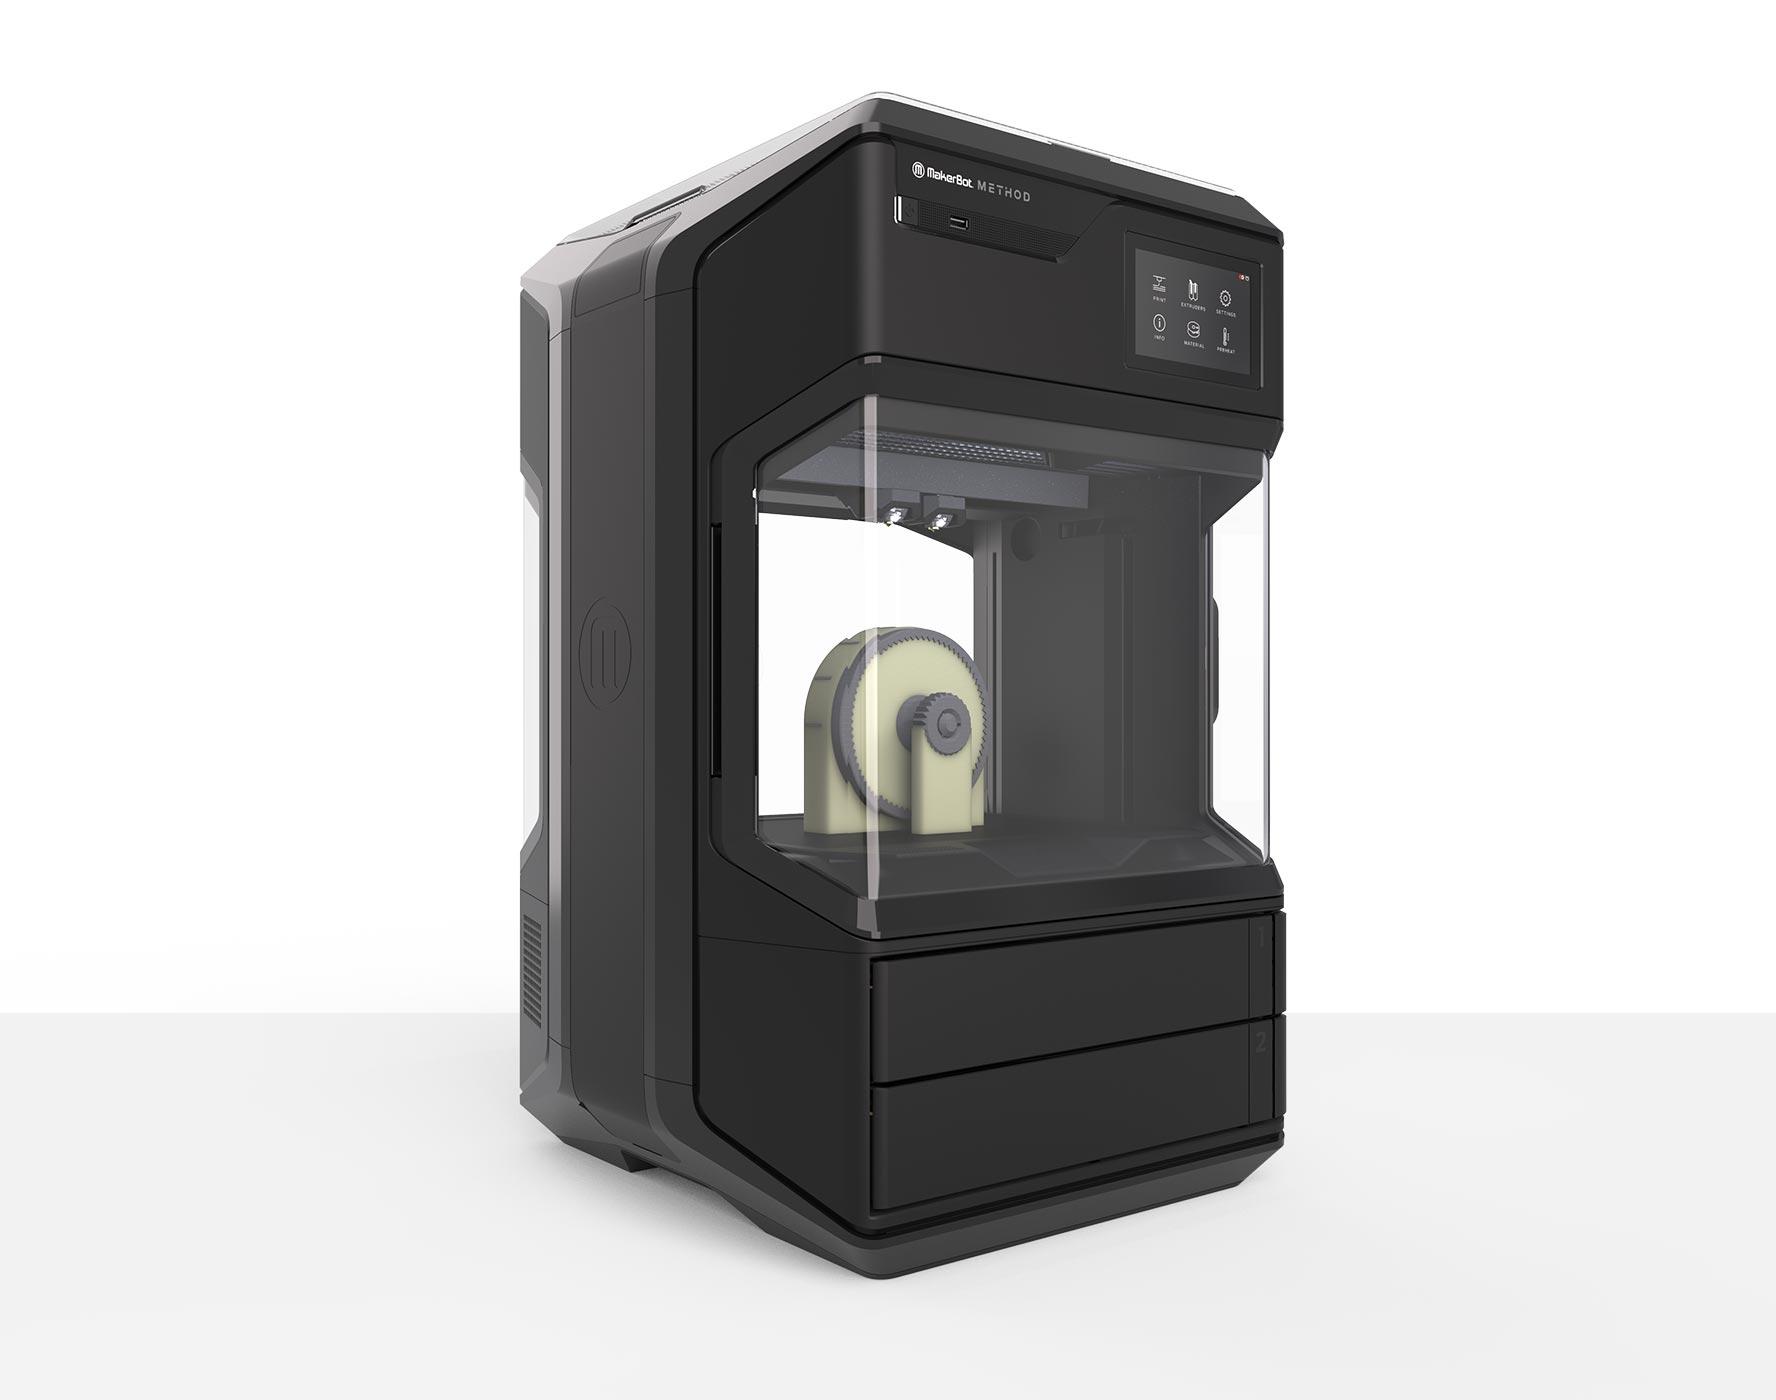 MakerBot METHOD 3D printer. Photo via MakerBot.